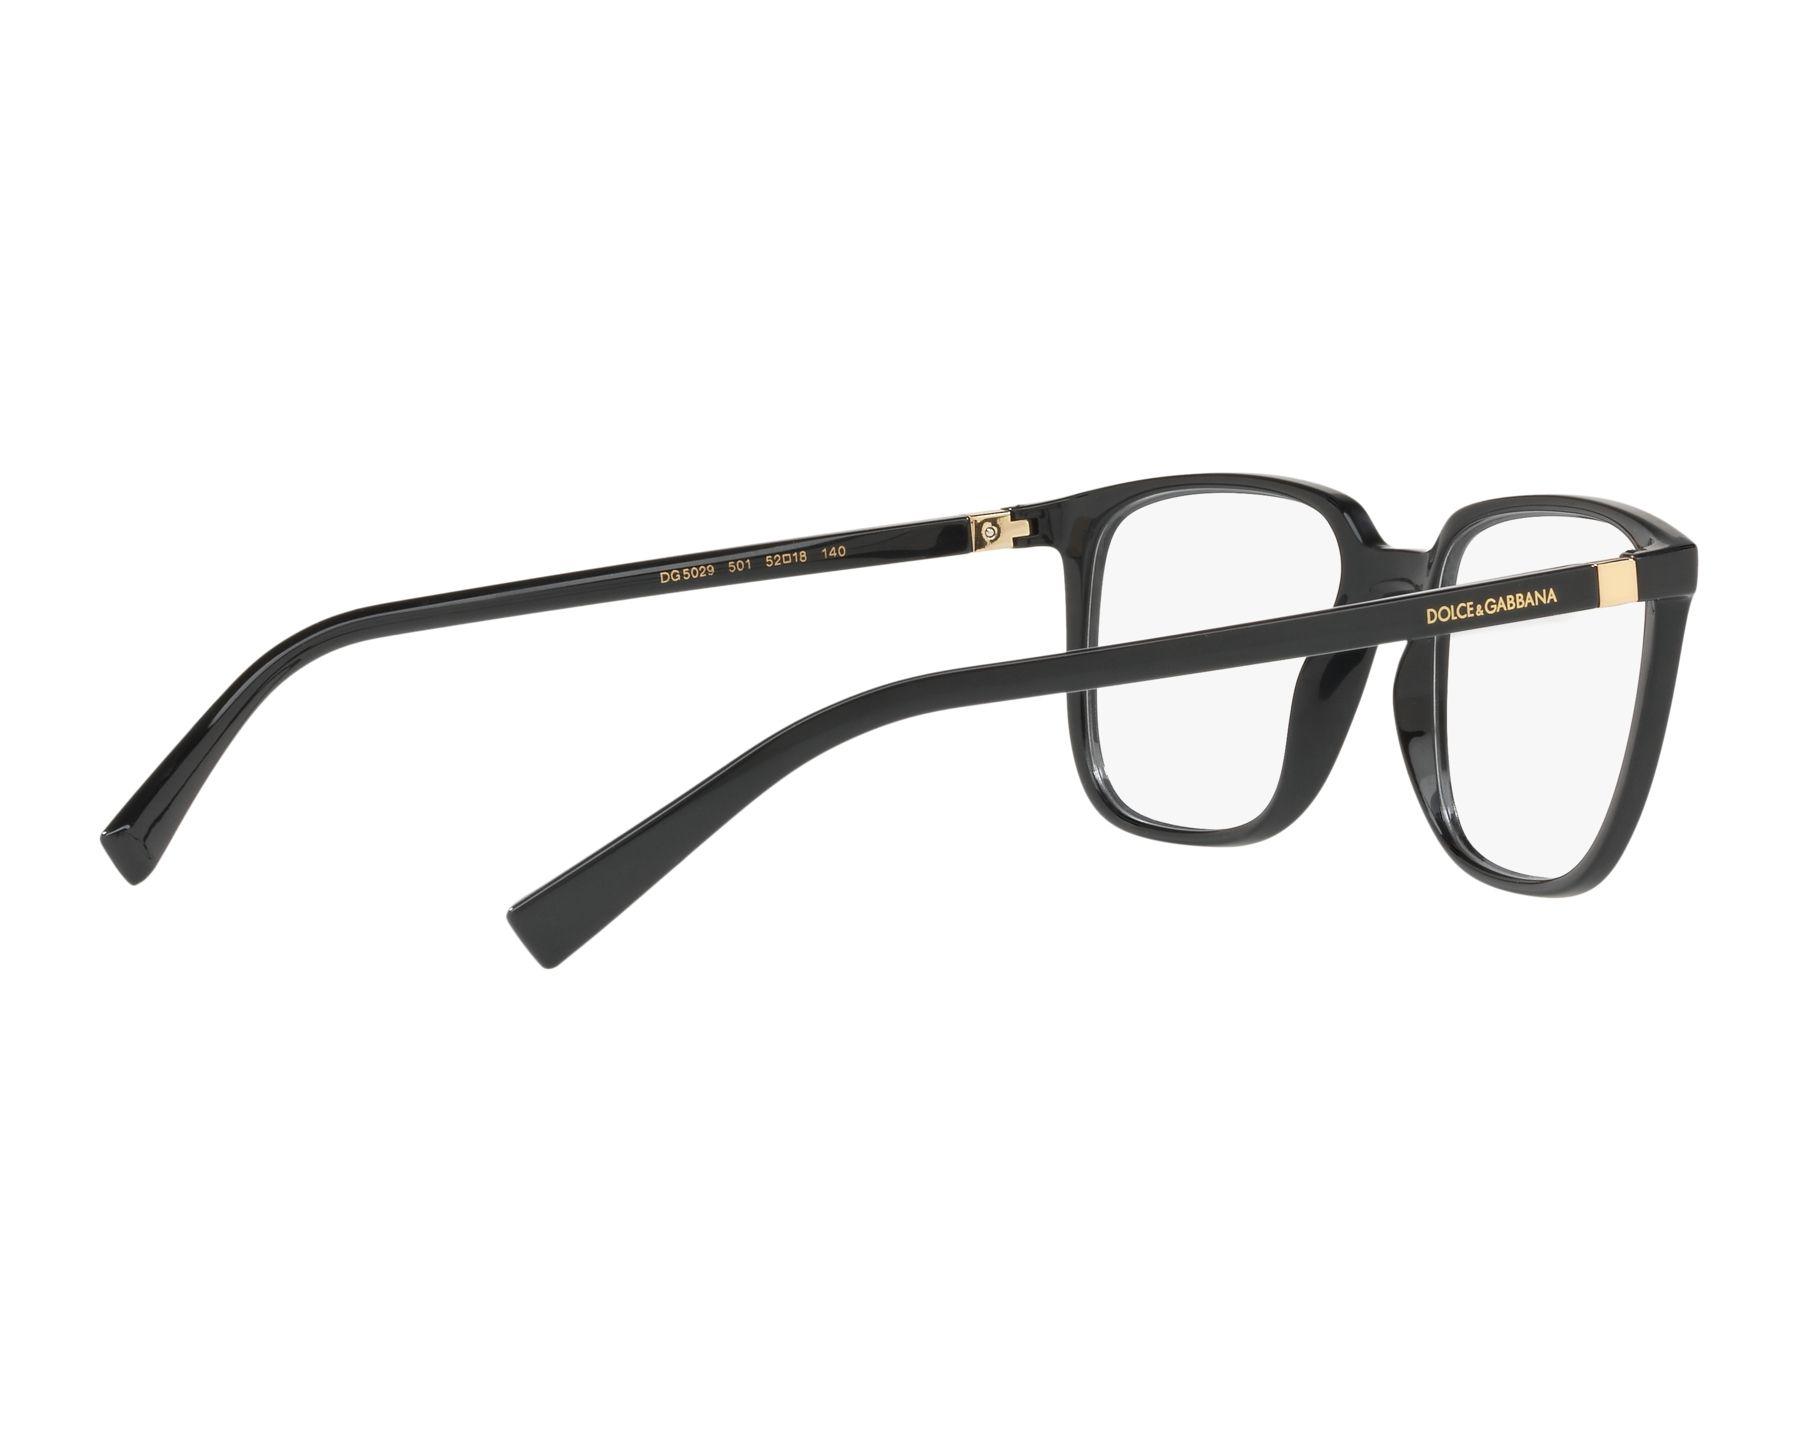 3725cd290a3 eyeglasses Dolce   Gabbana DG-5029 501 54-18 Black Gold 360 degree view